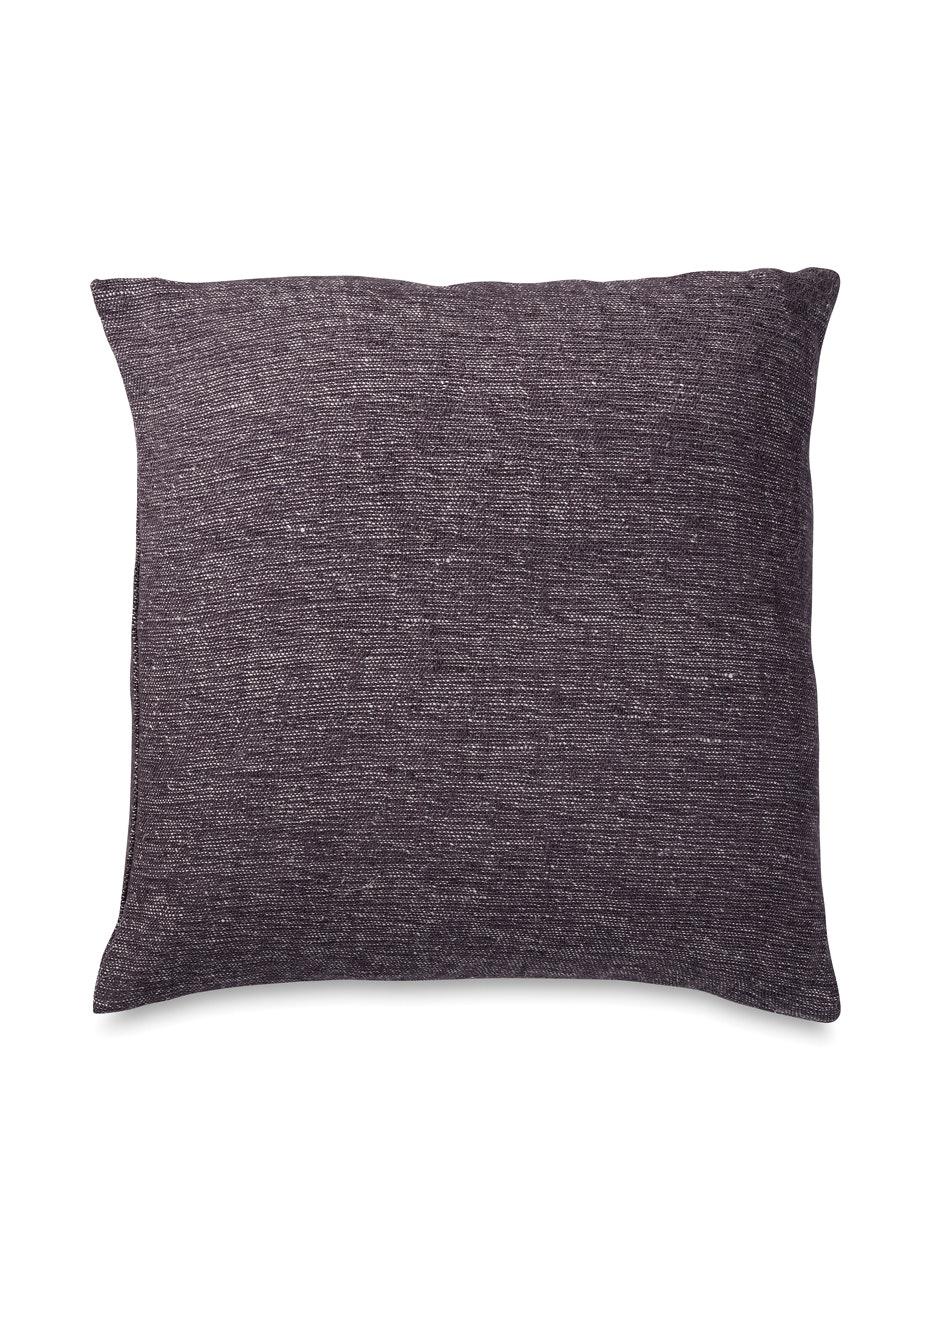 Città - Dolce Linen Cushion Cover - Cocoa